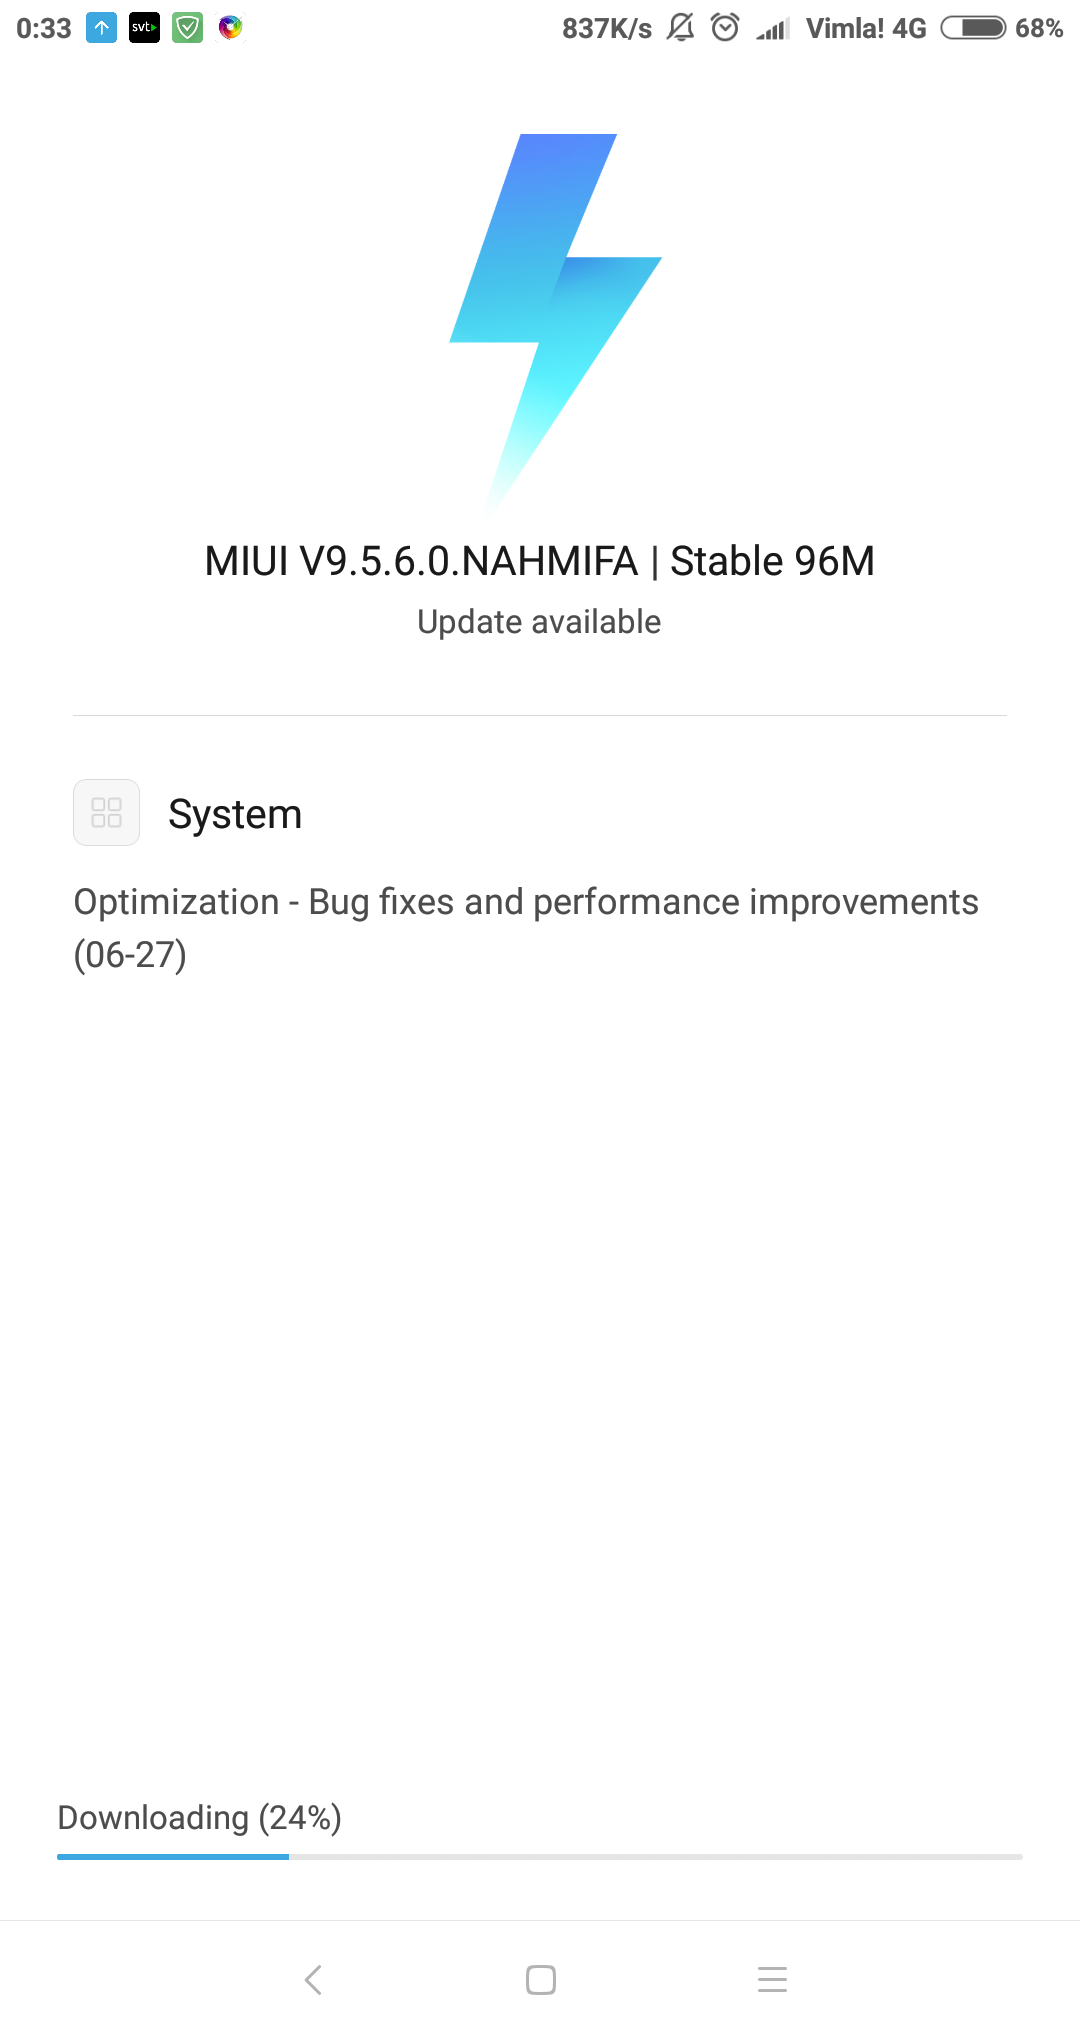 Screenshot_2018-06-28-00-33-29-248_com.android.updater.png